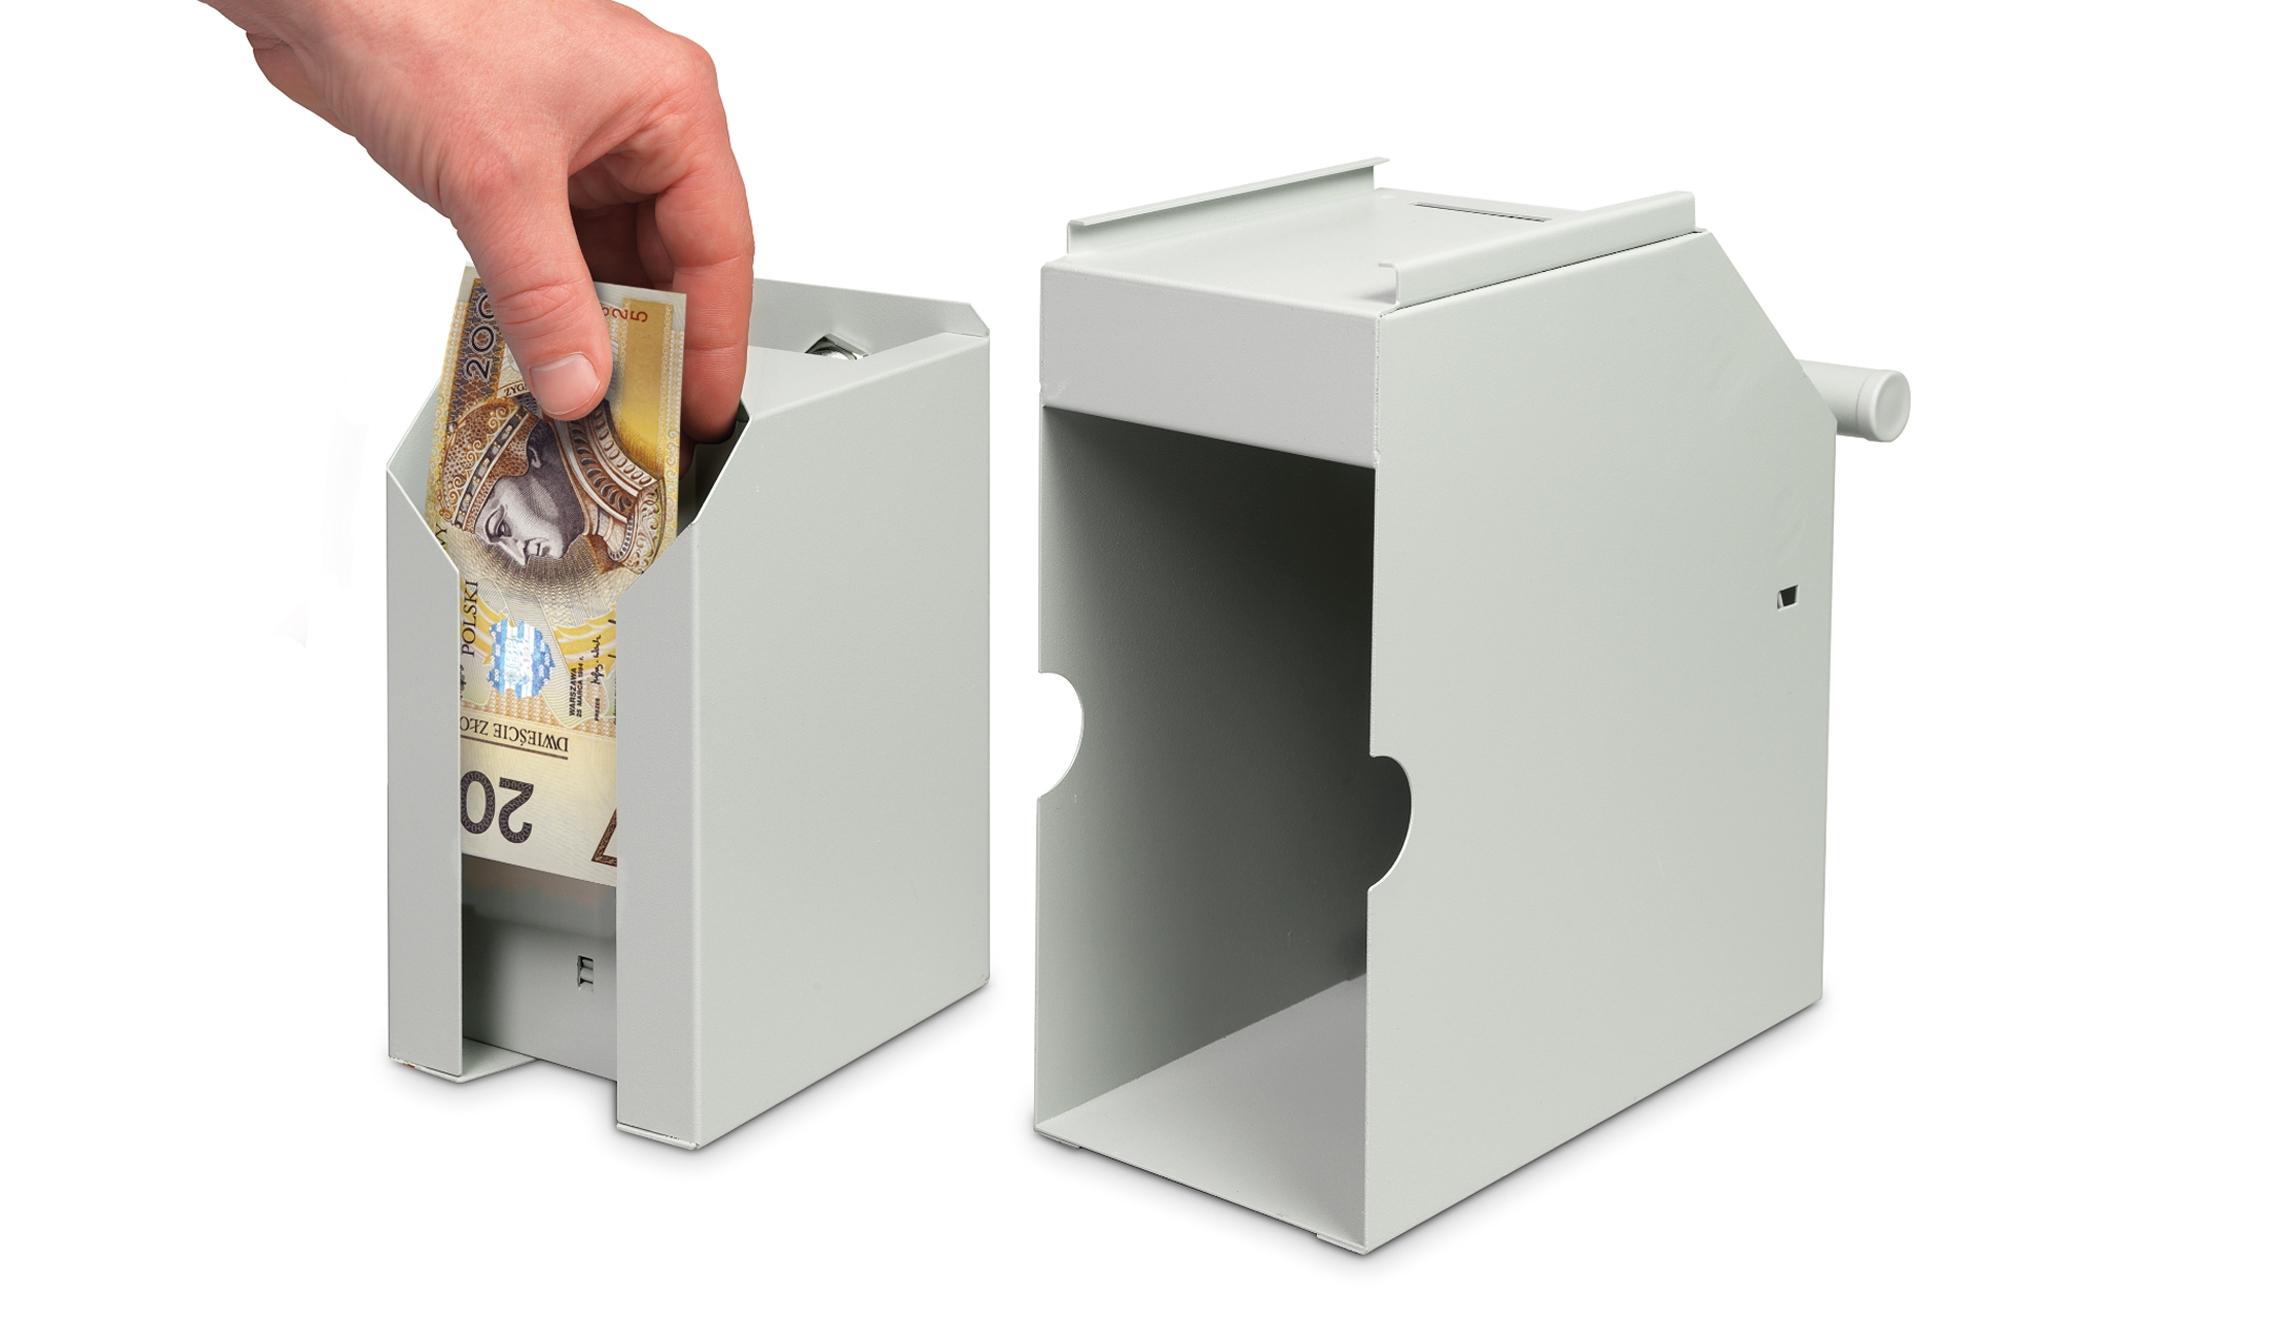 safescan-4100w-sejf-na-banknoty